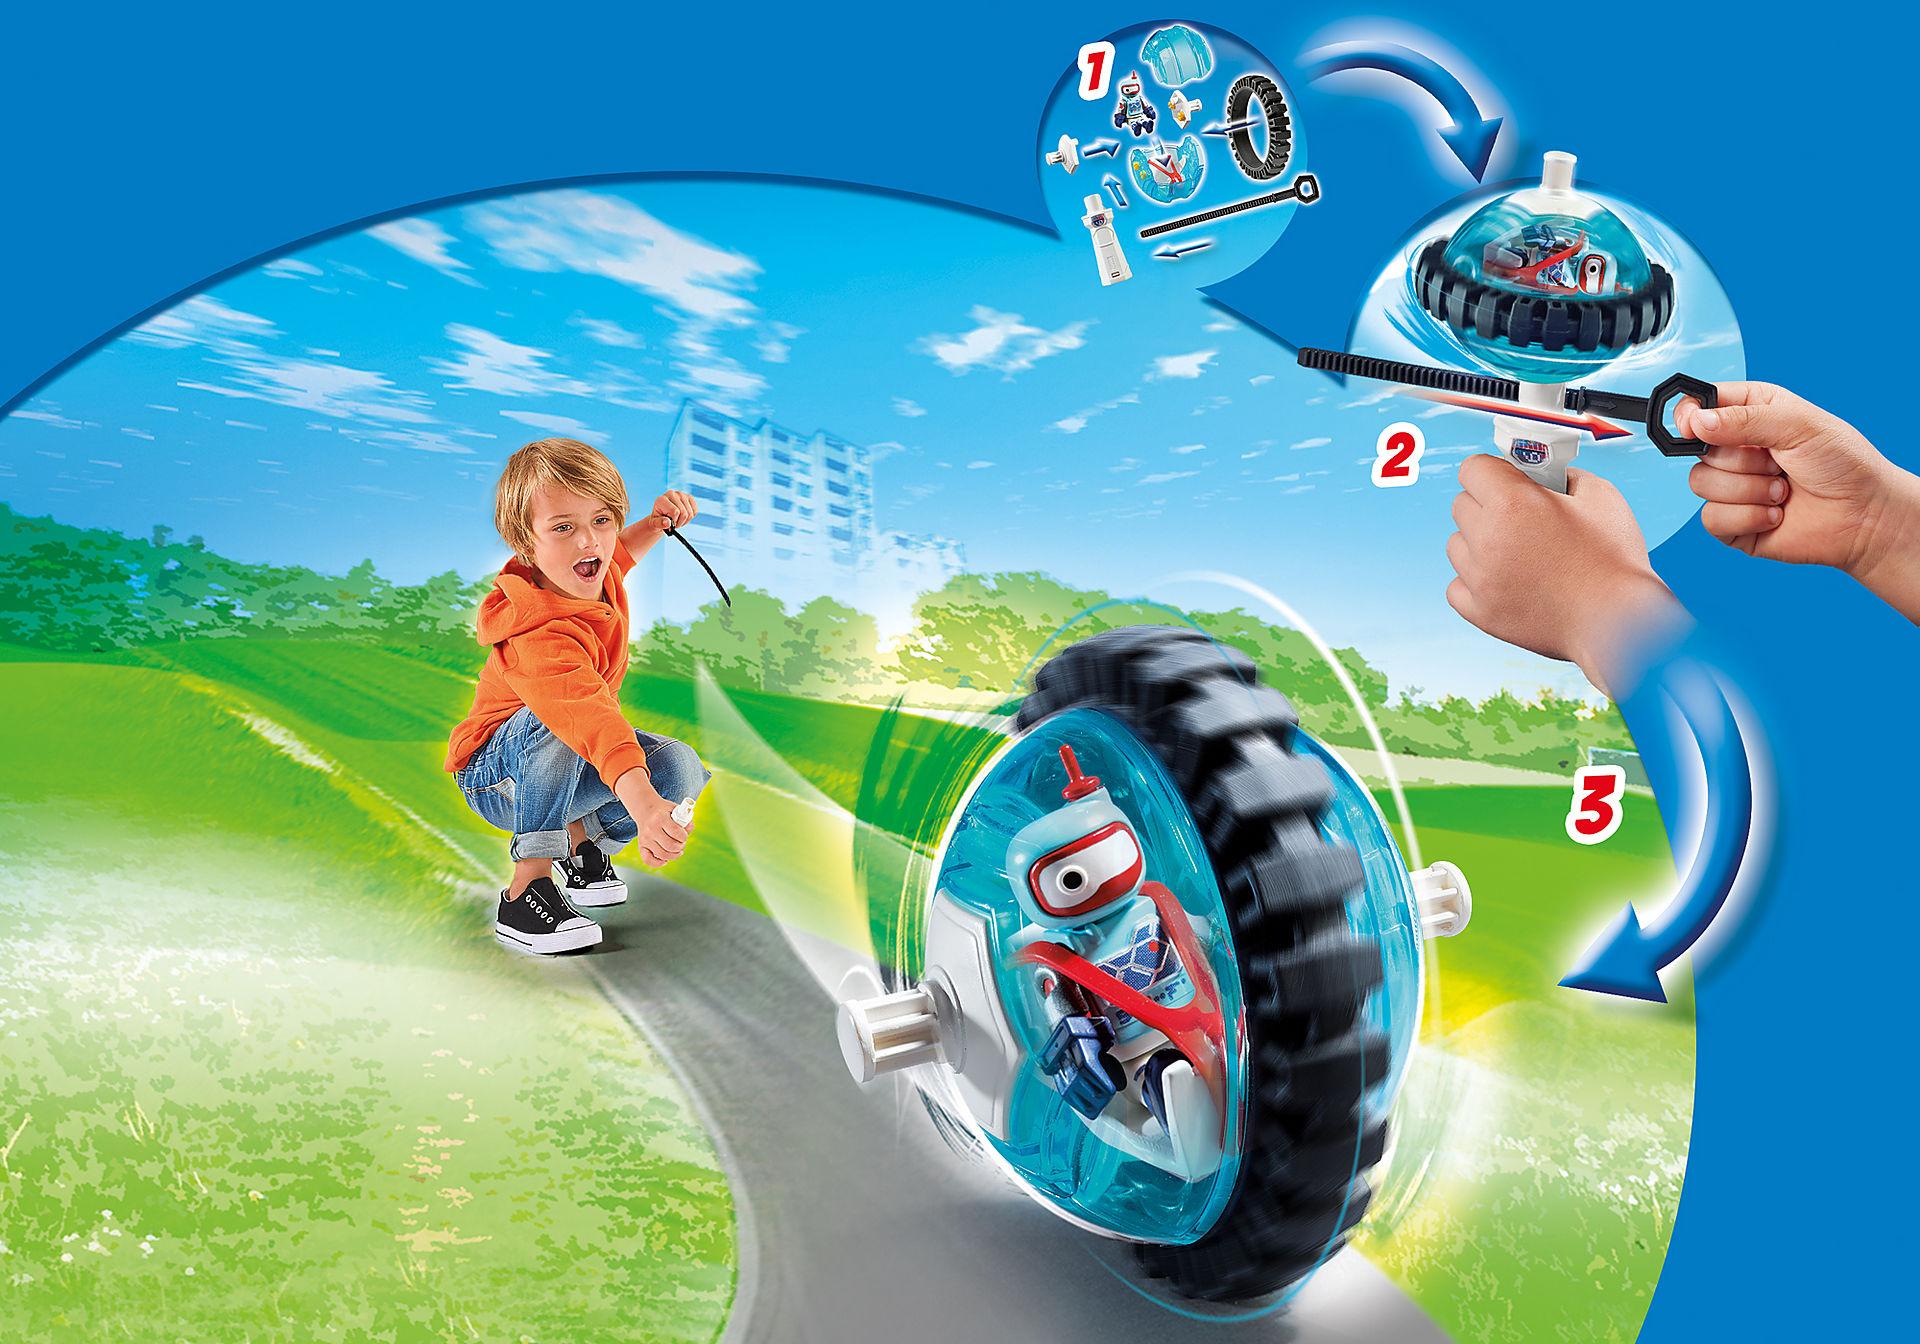 http://media.playmobil.com/i/playmobil/9204_product_extra2/Μπλε Speed Roller